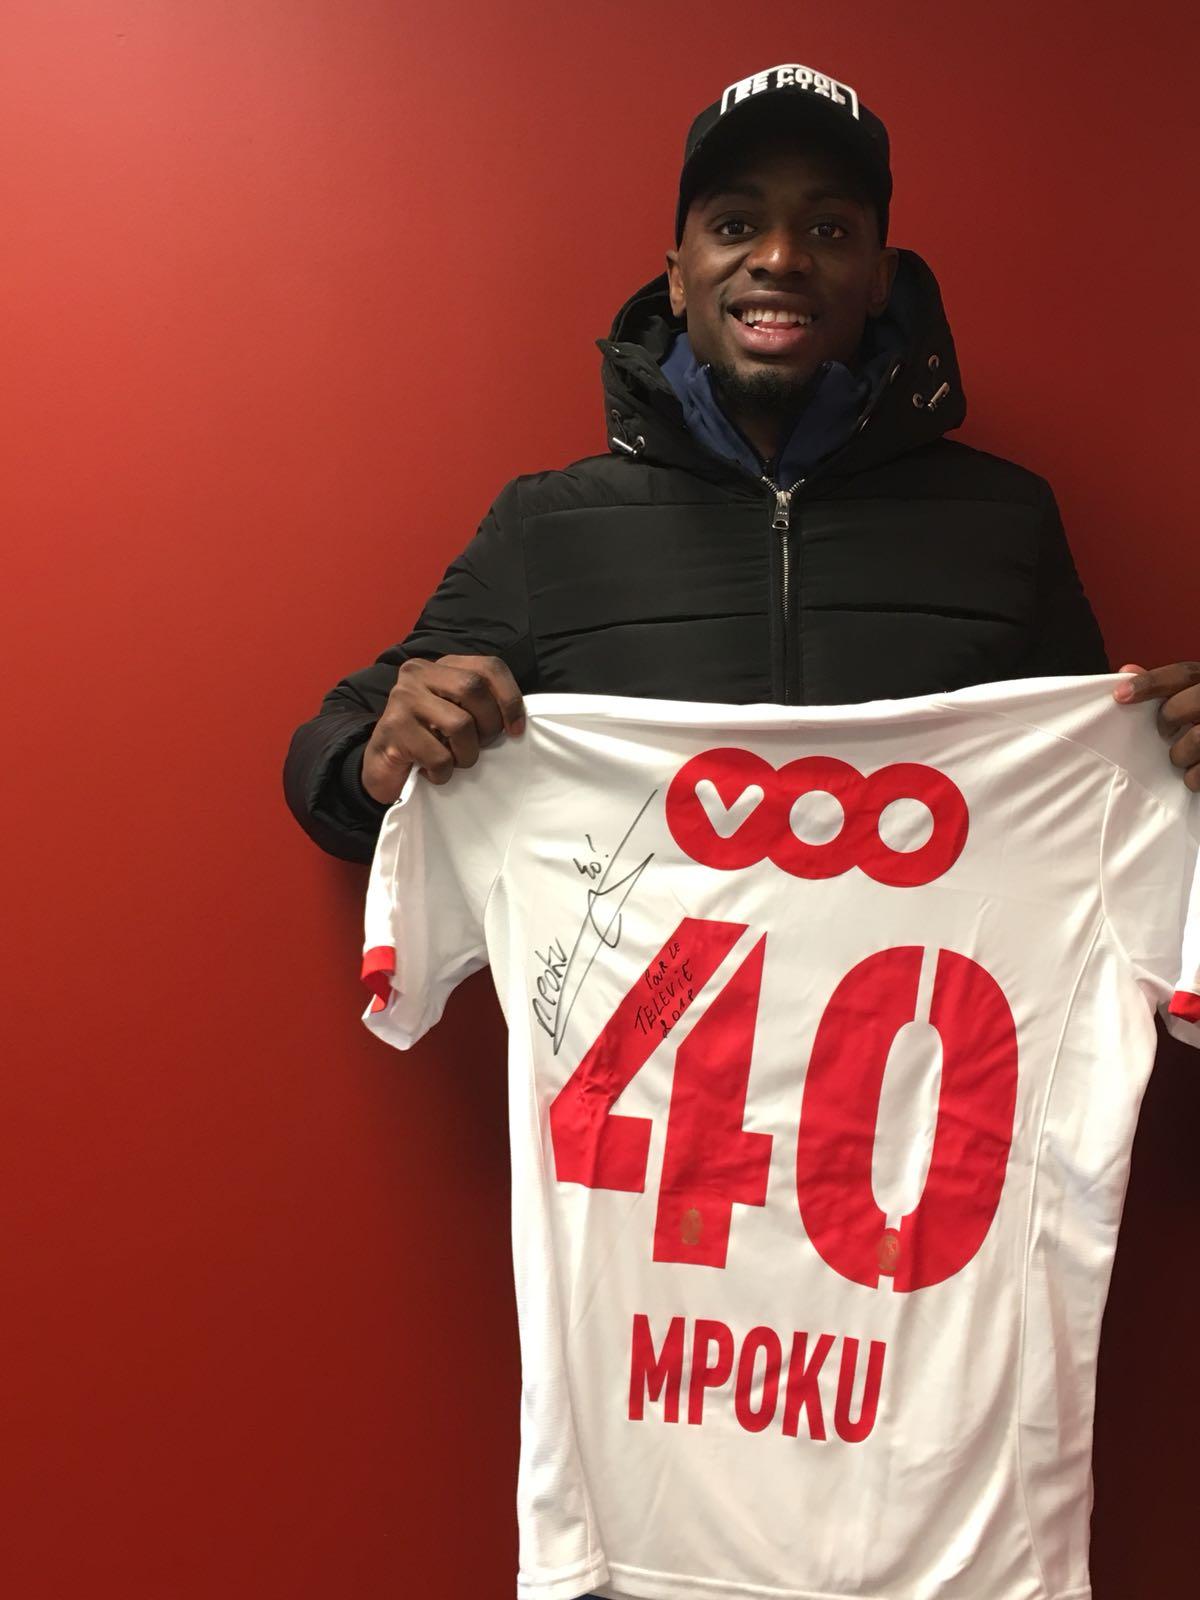 Maillot de Mpoku